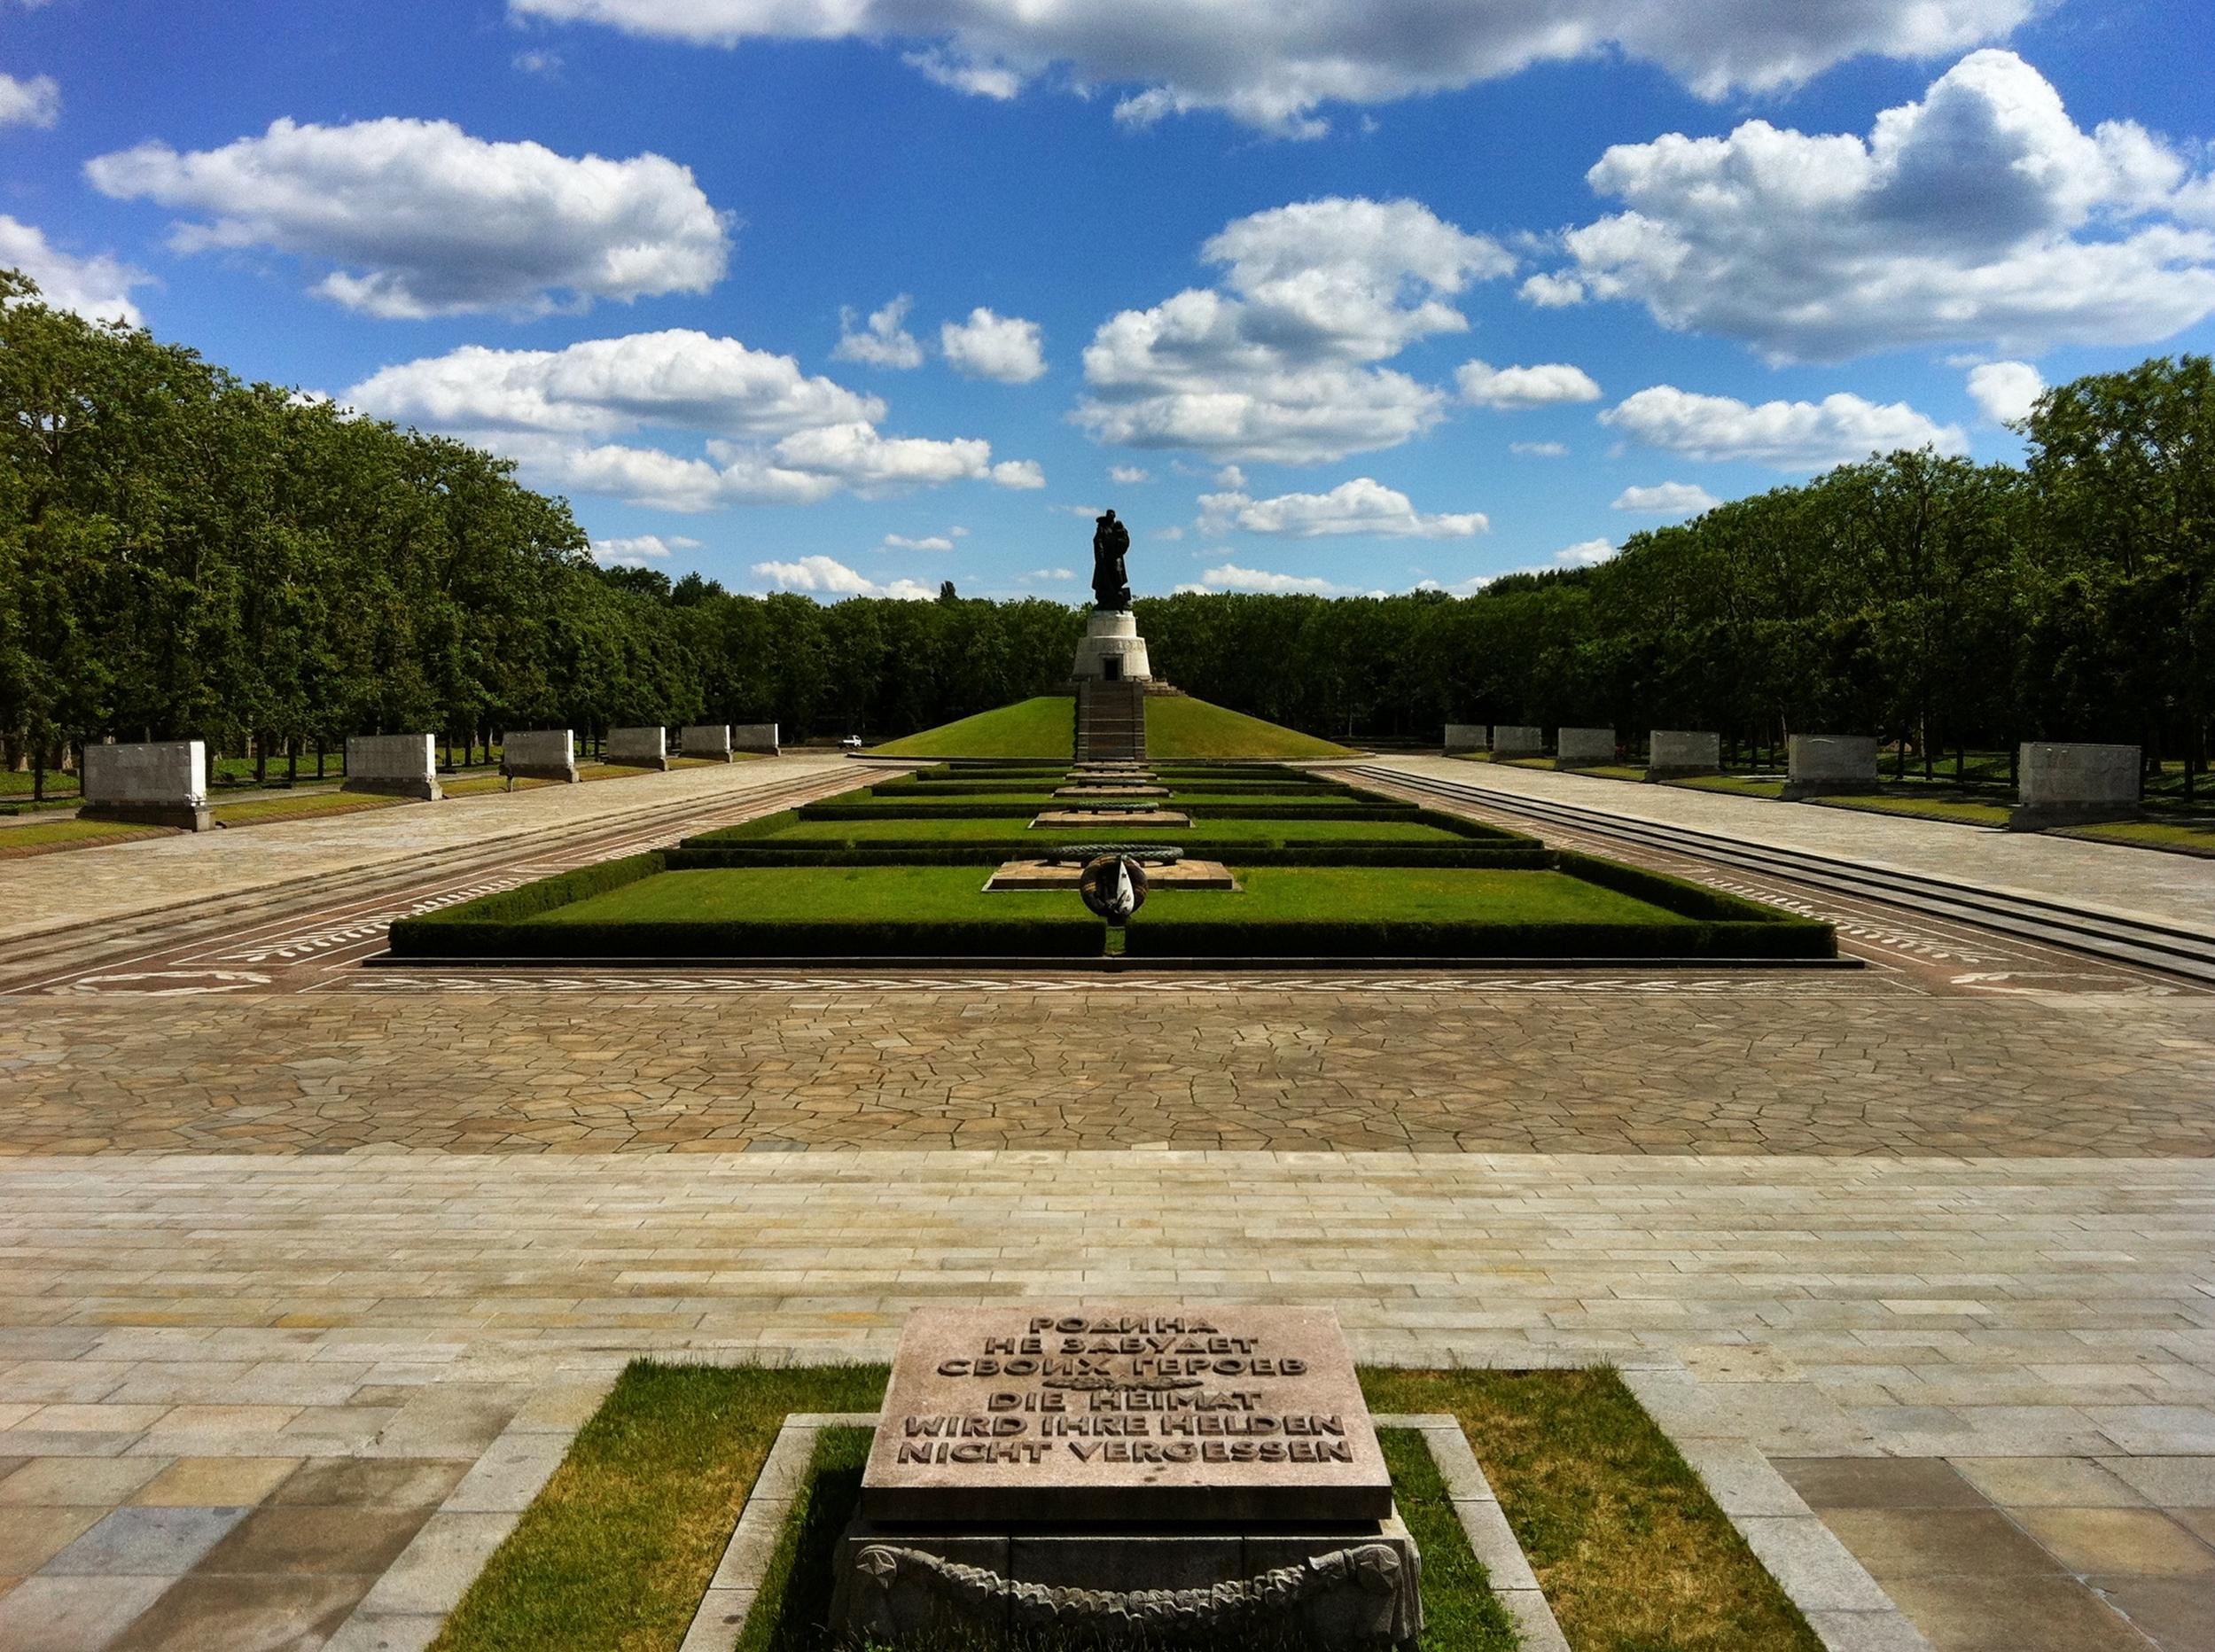 Berlin Treptower Park